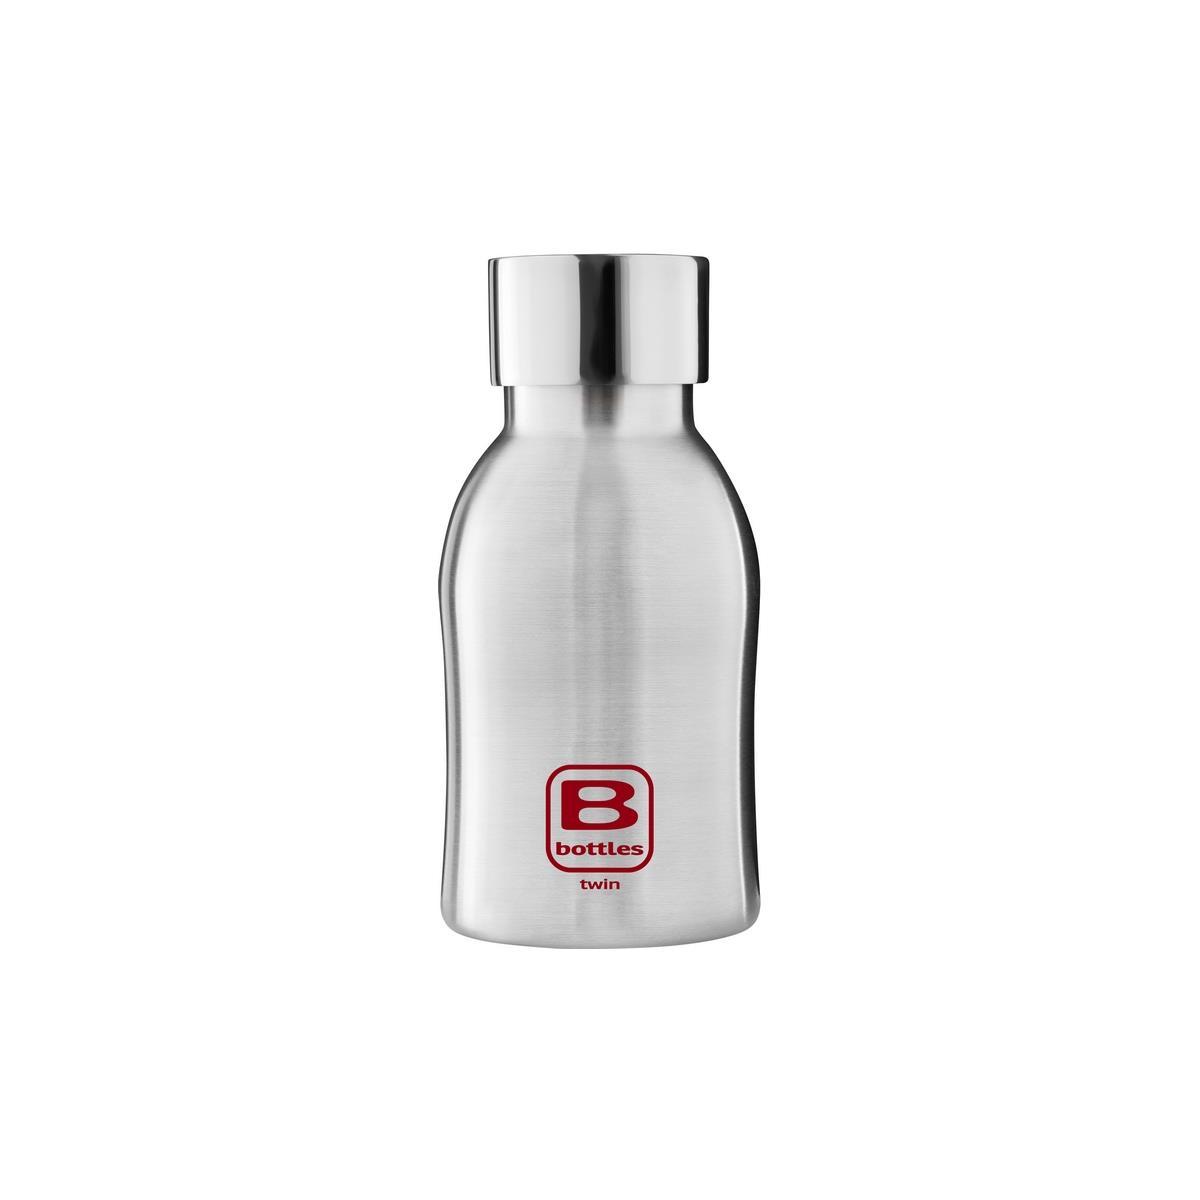 B Bottles Twin - Steel Brushed - 250 ml - Bottiglia Termica a doppia parete in acciaio inox 18/10